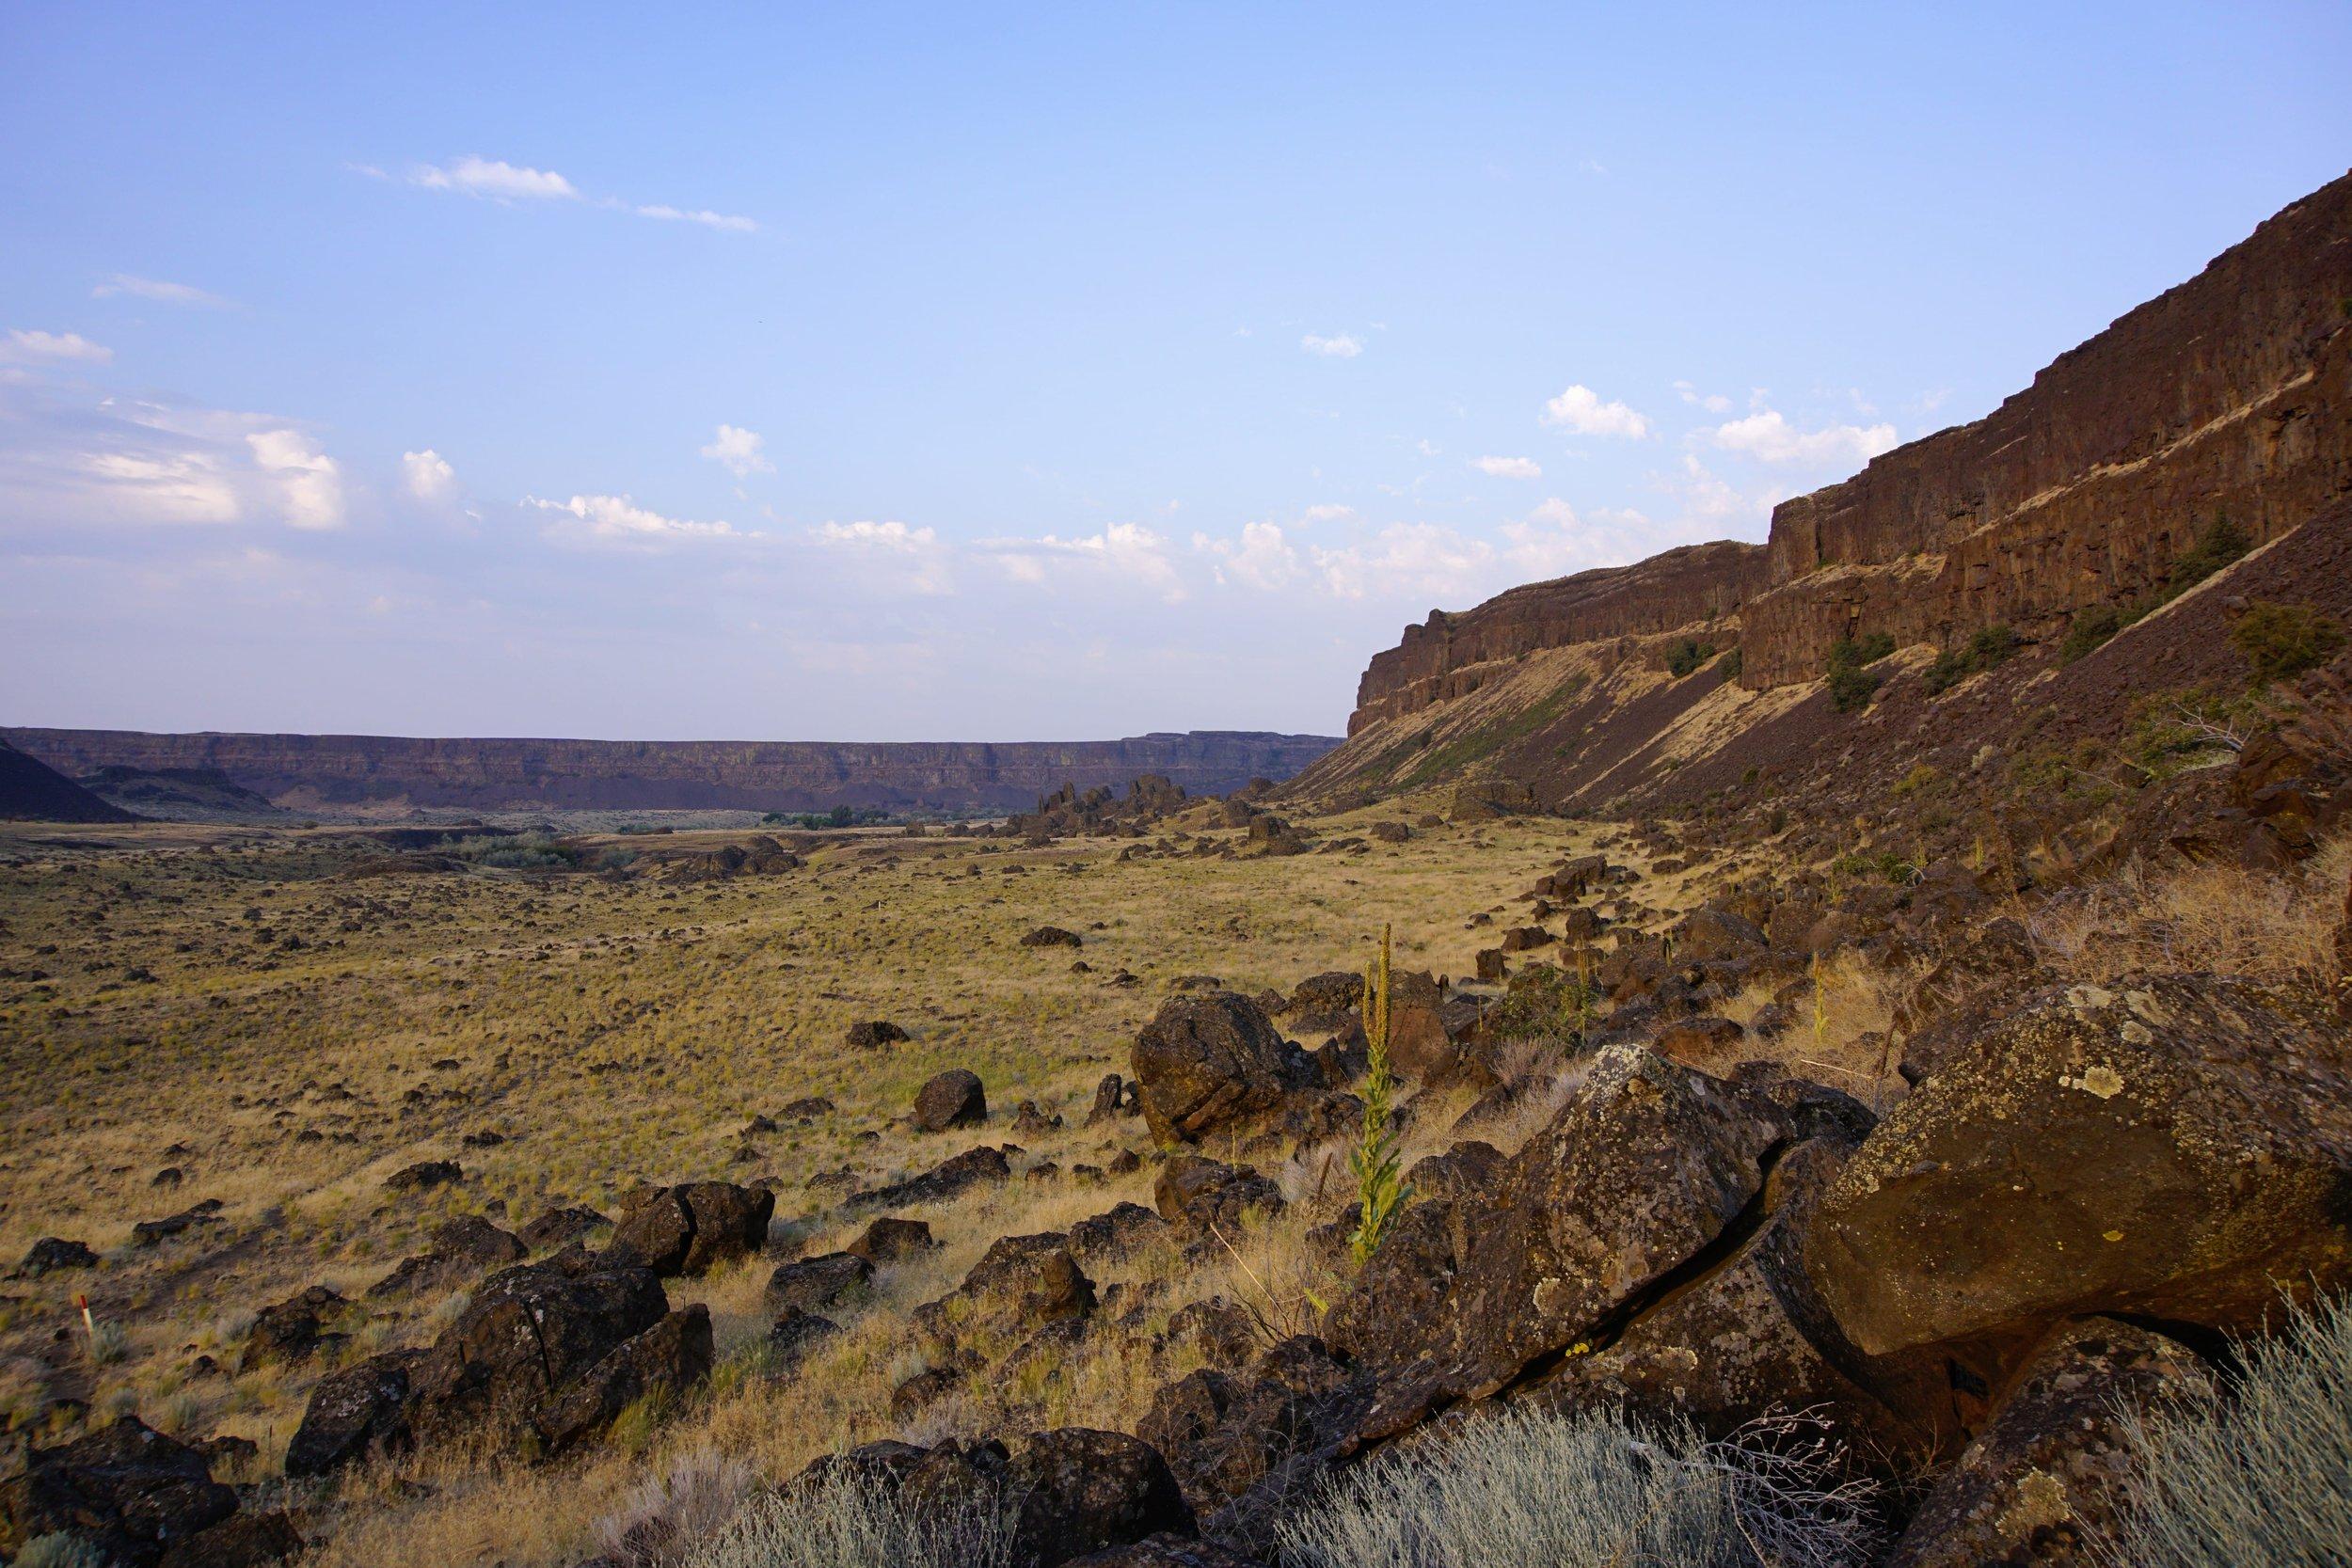 Southwest views